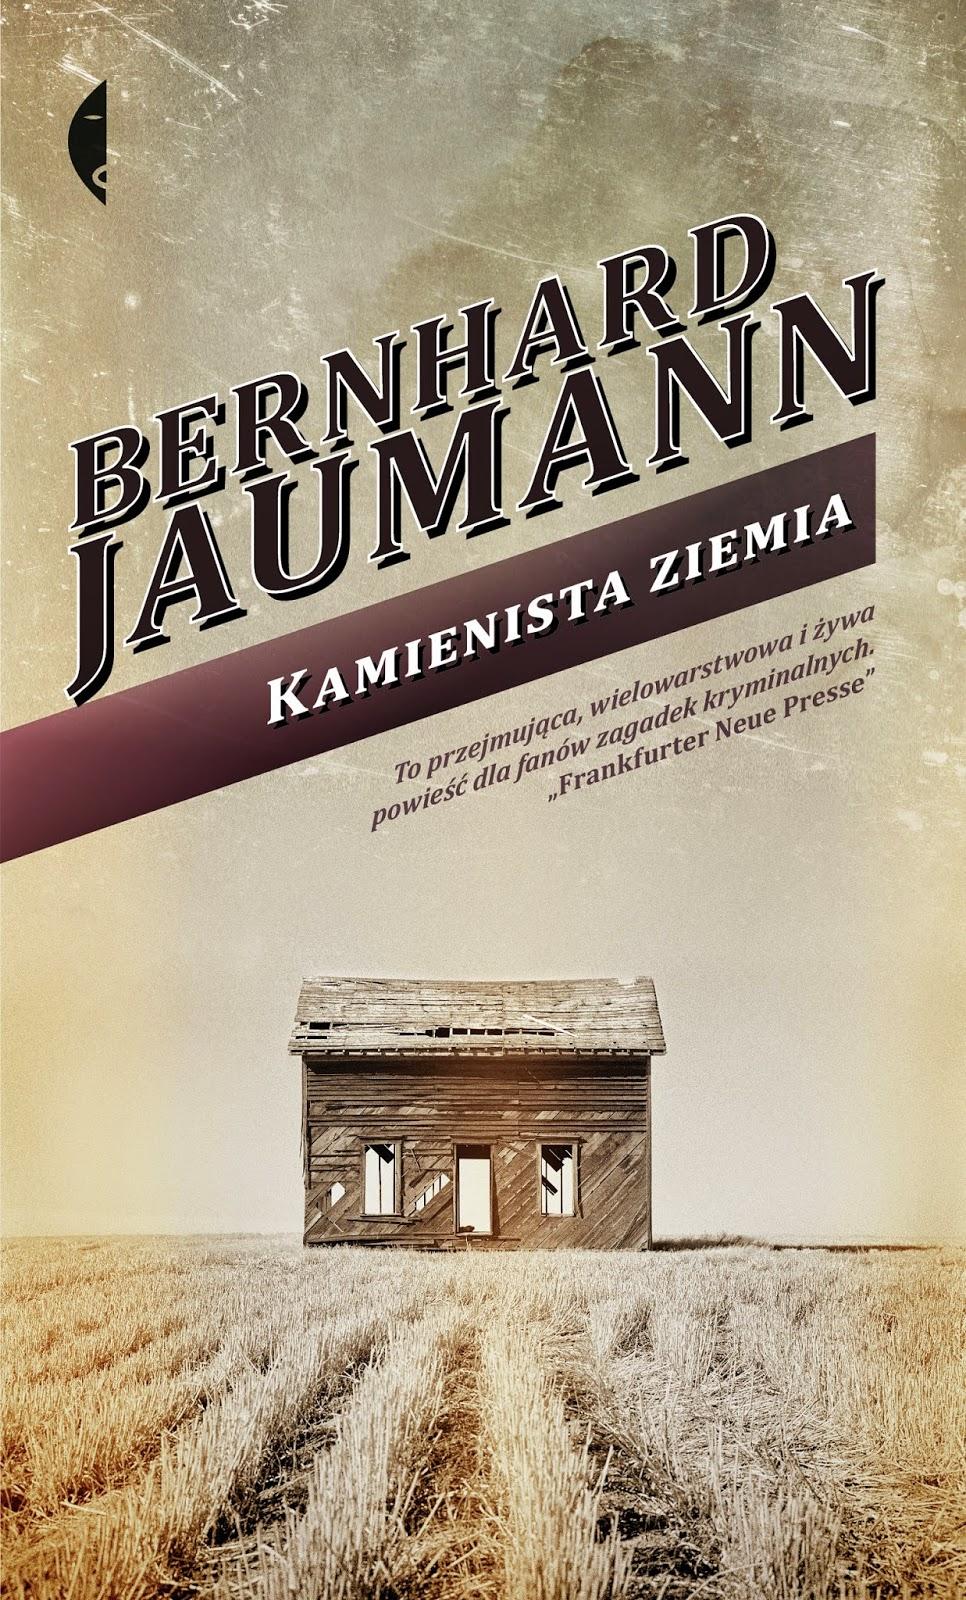 https://czarne.com.pl/katalog/ksiazki/kamienista-ziemia